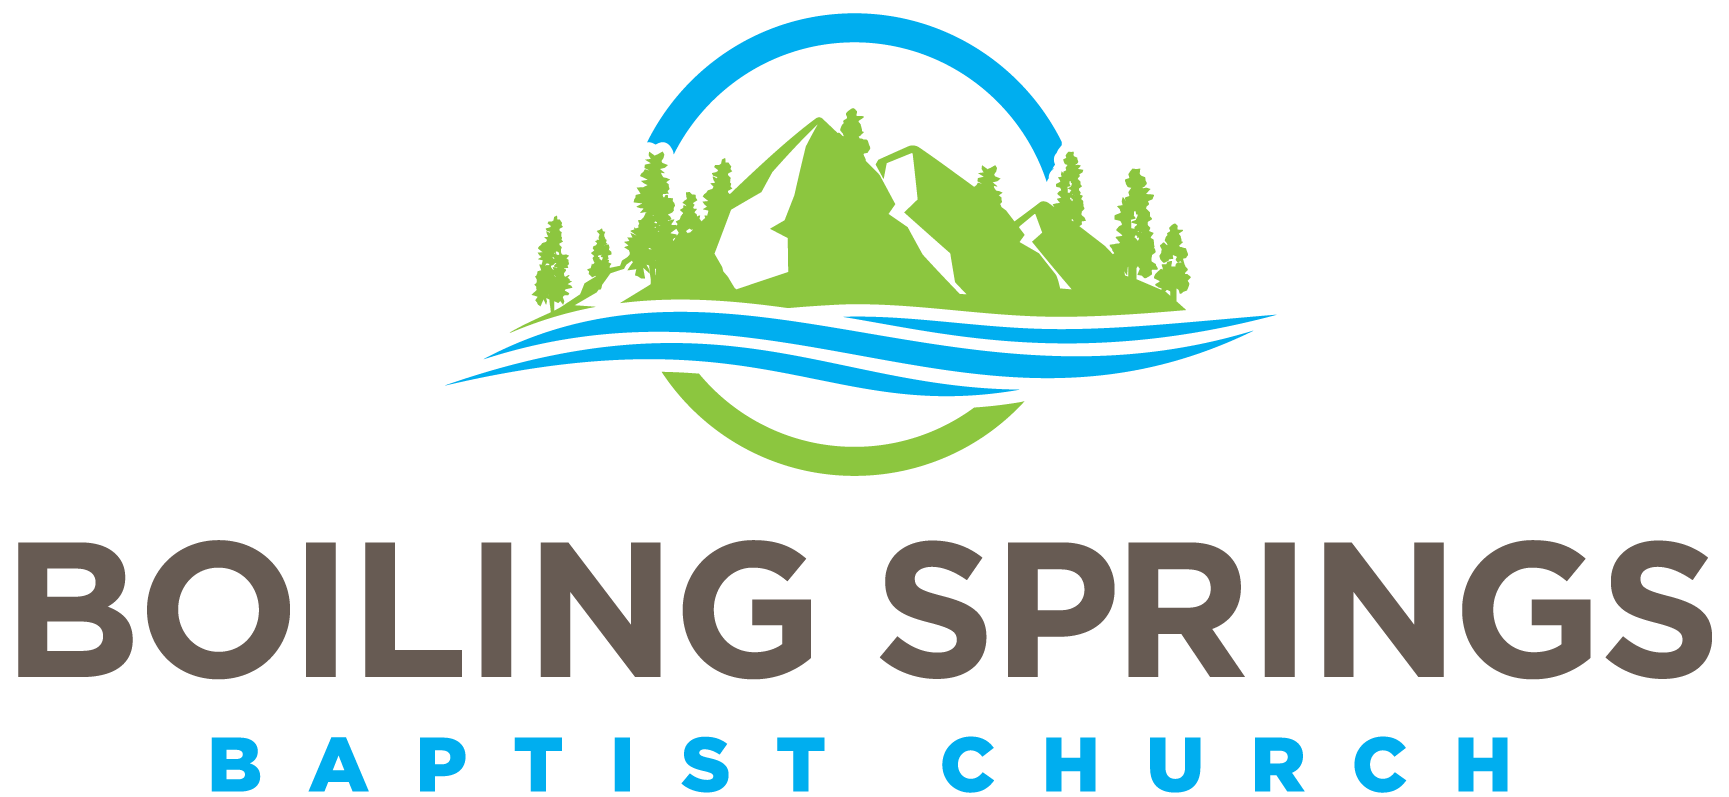 Boiling Springs BC LOGO 1906-17_block-01 cropped